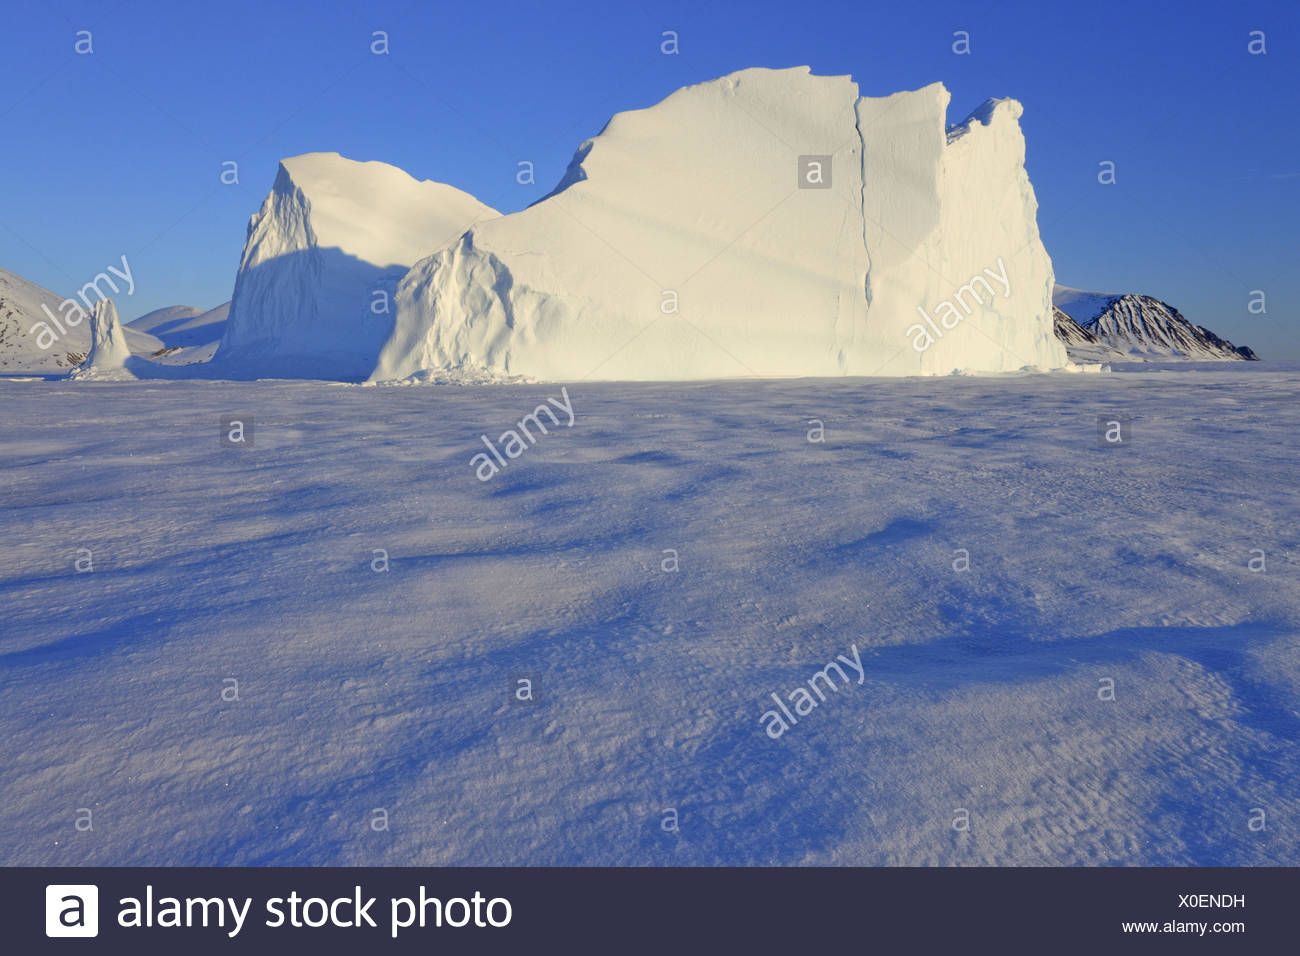 North America, Canada, Nordkanada, Nunavut, Baffin Iceland, Pond, Inlet, Eclipse sound, pack ice, iceberg, - Stock Image